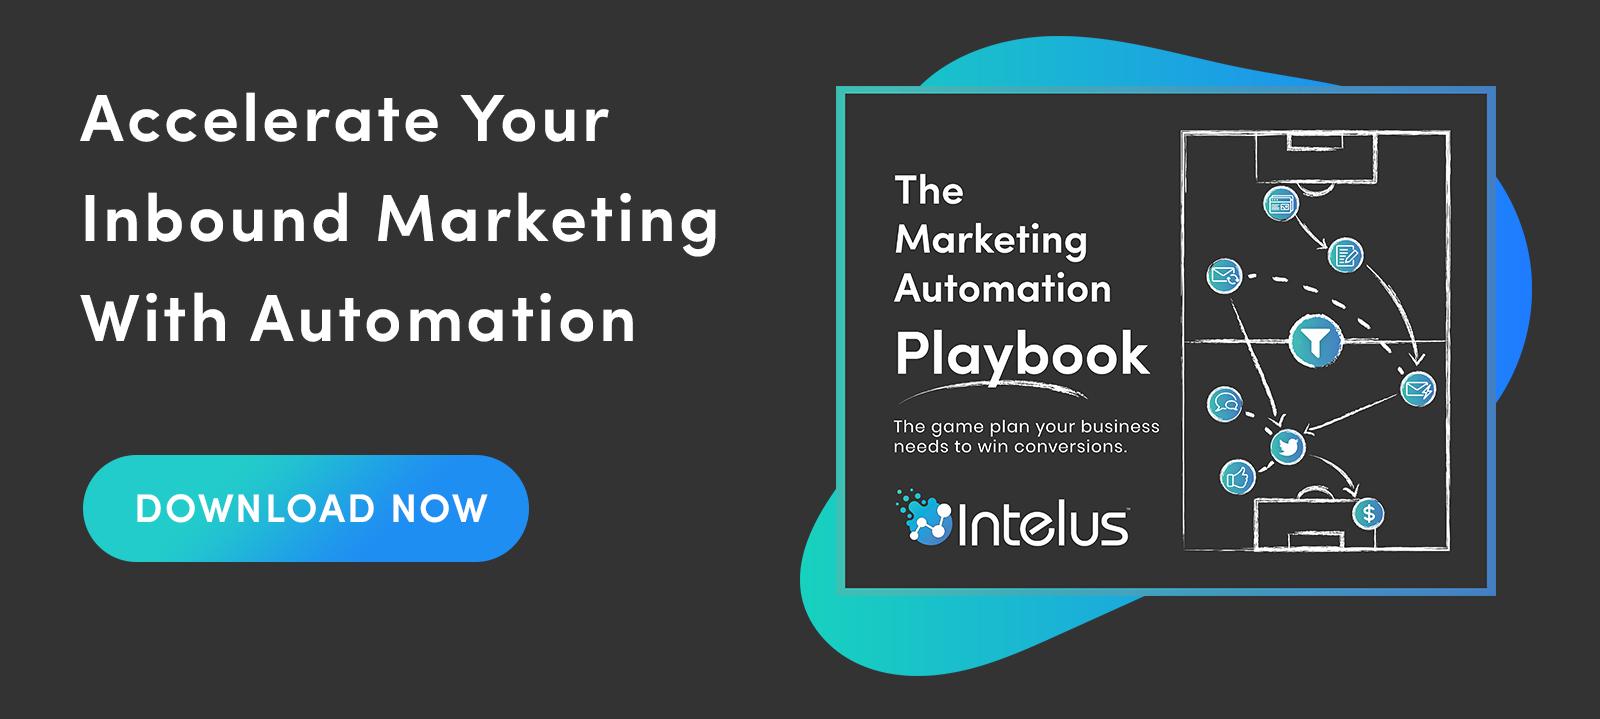 marketing automation playbook